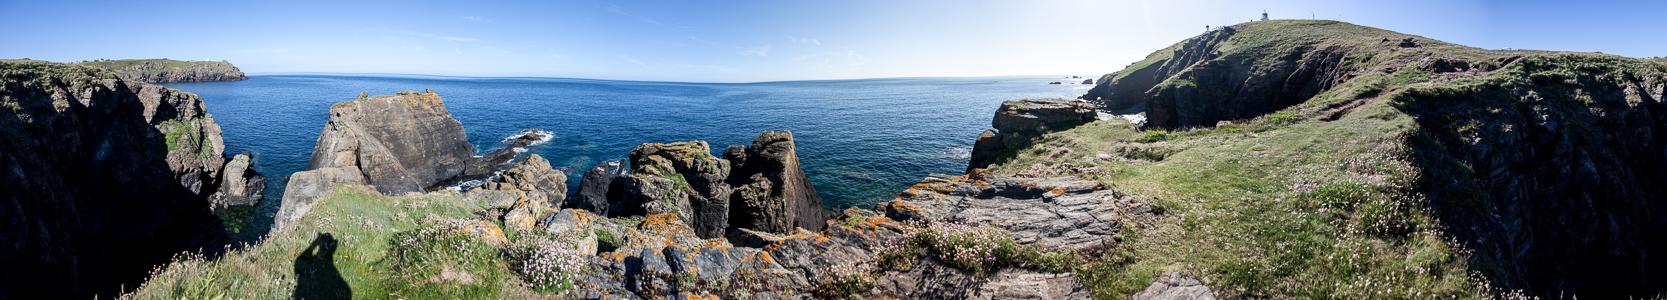 Lizard Point, Housel Bay, Ärmelkanal (English Channel)